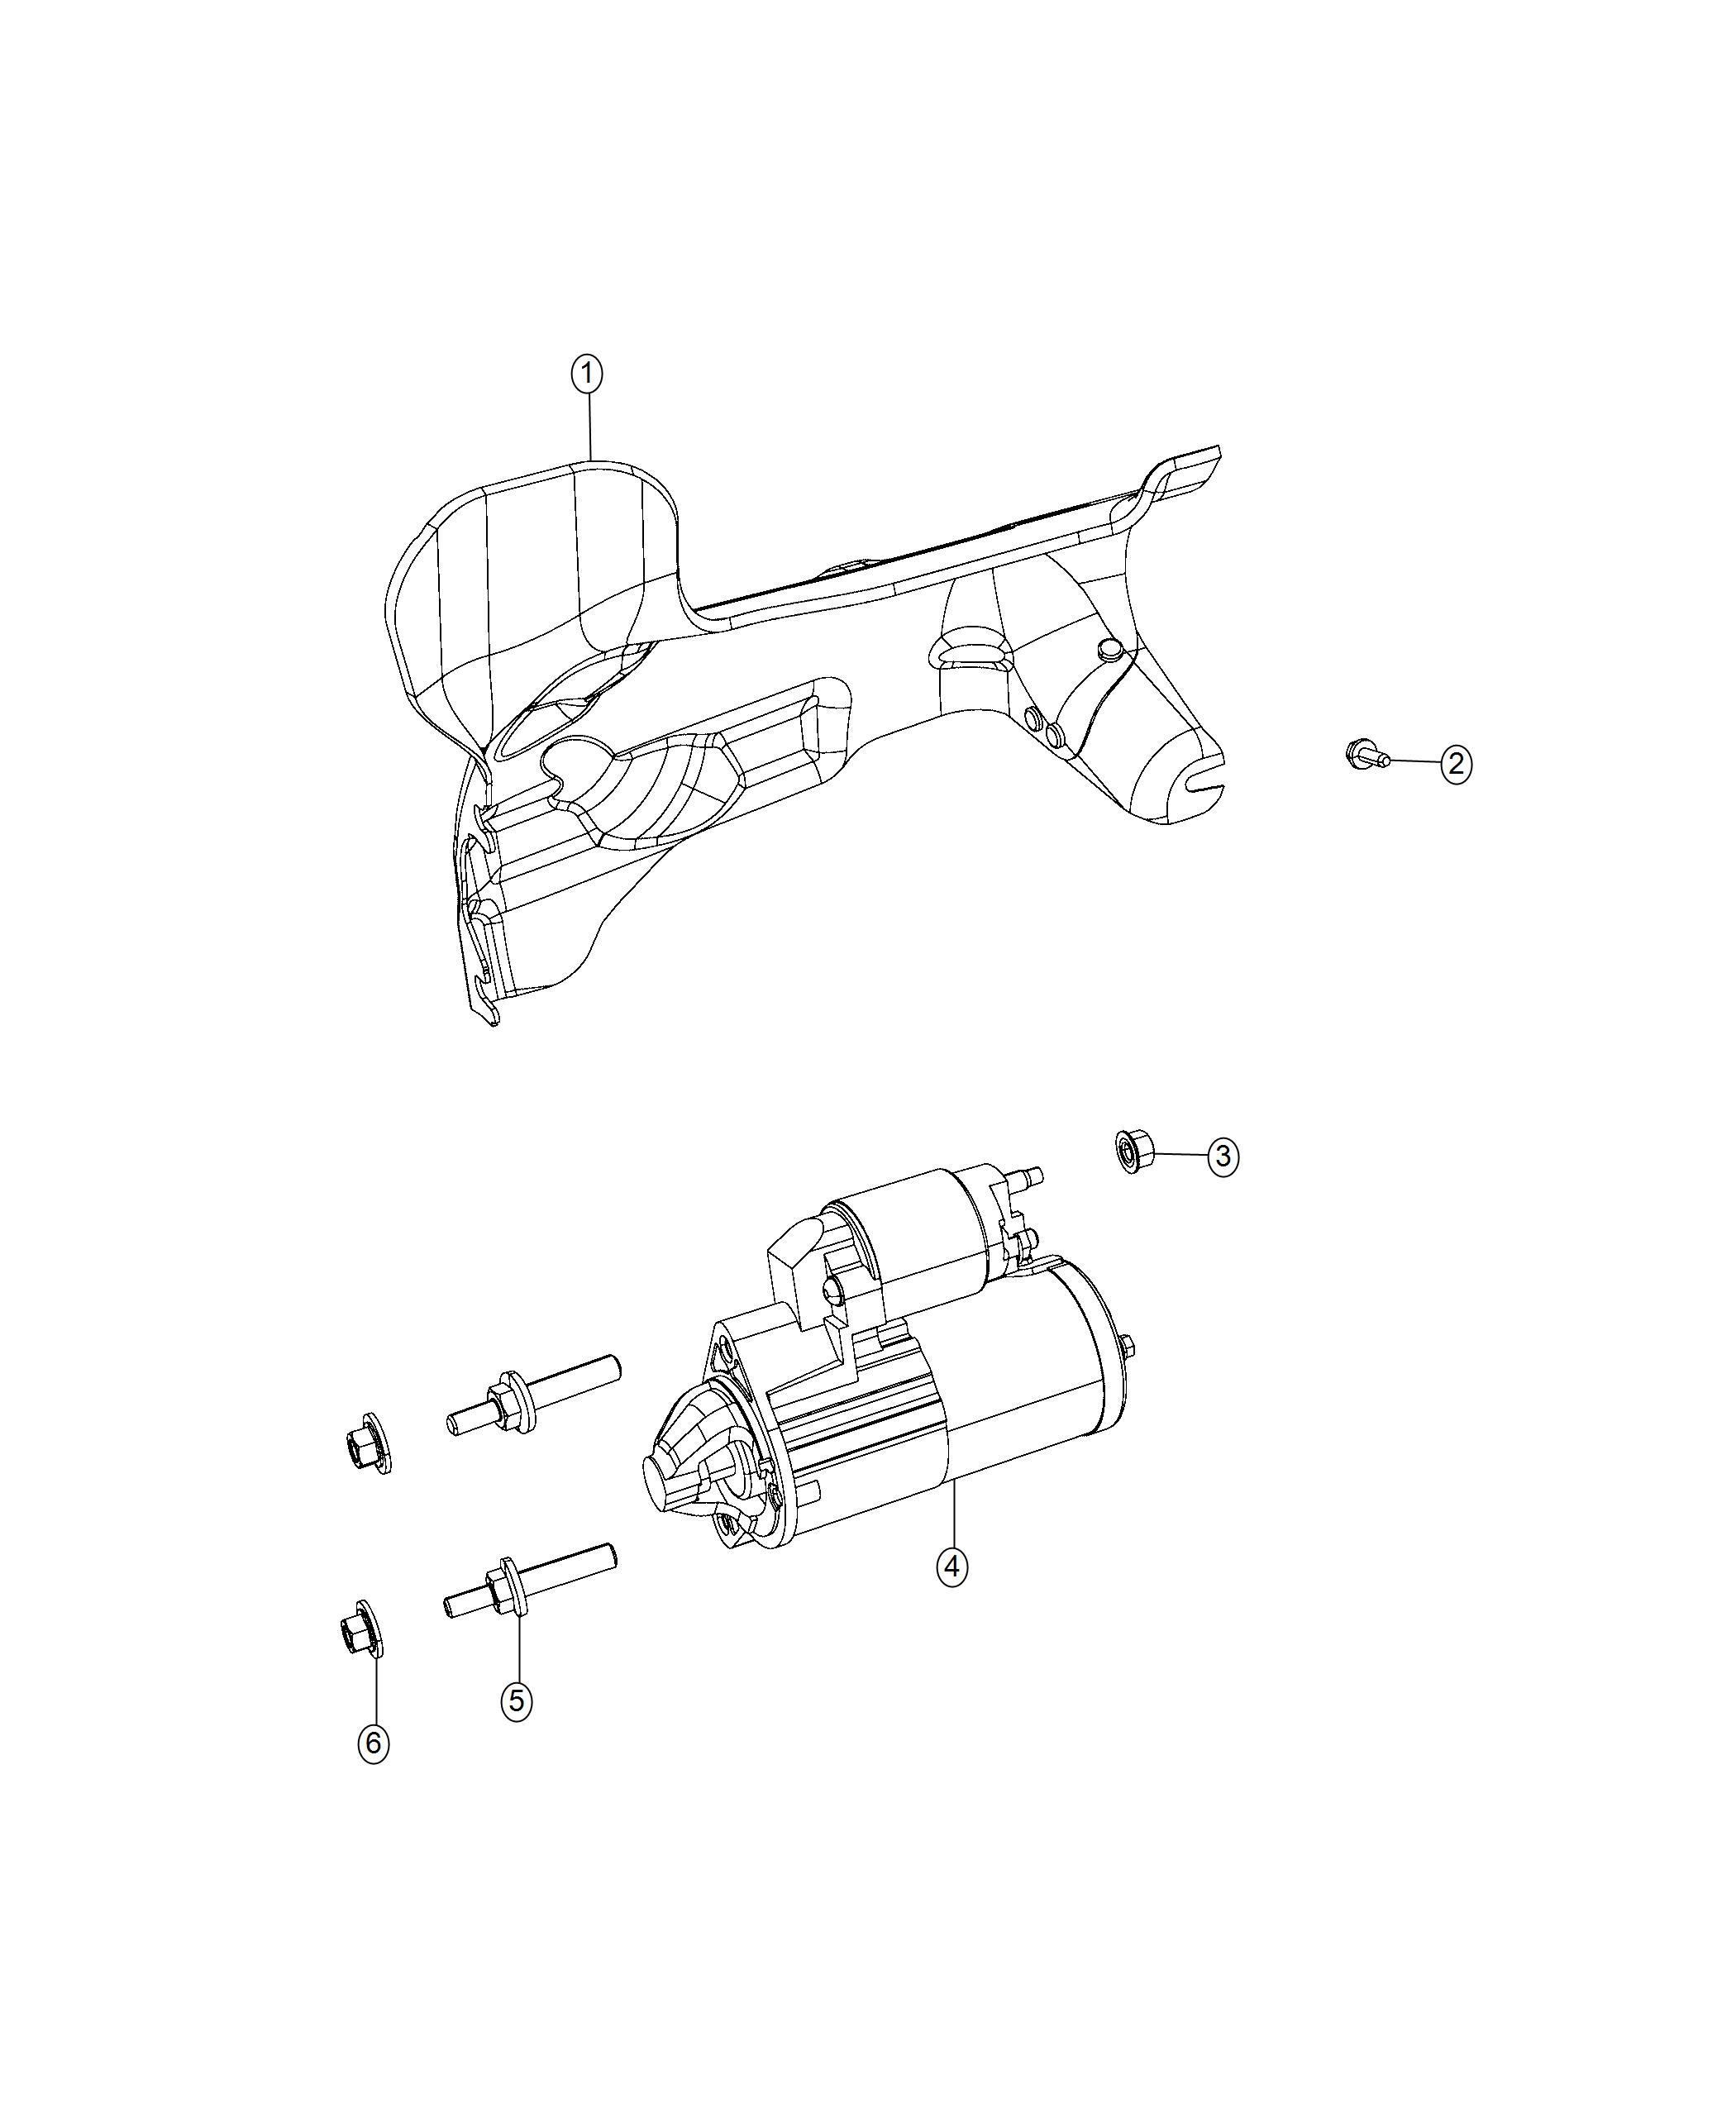 2018 Jeep Grand Cherokee Starter  Engine  Hemi  Related  Mds